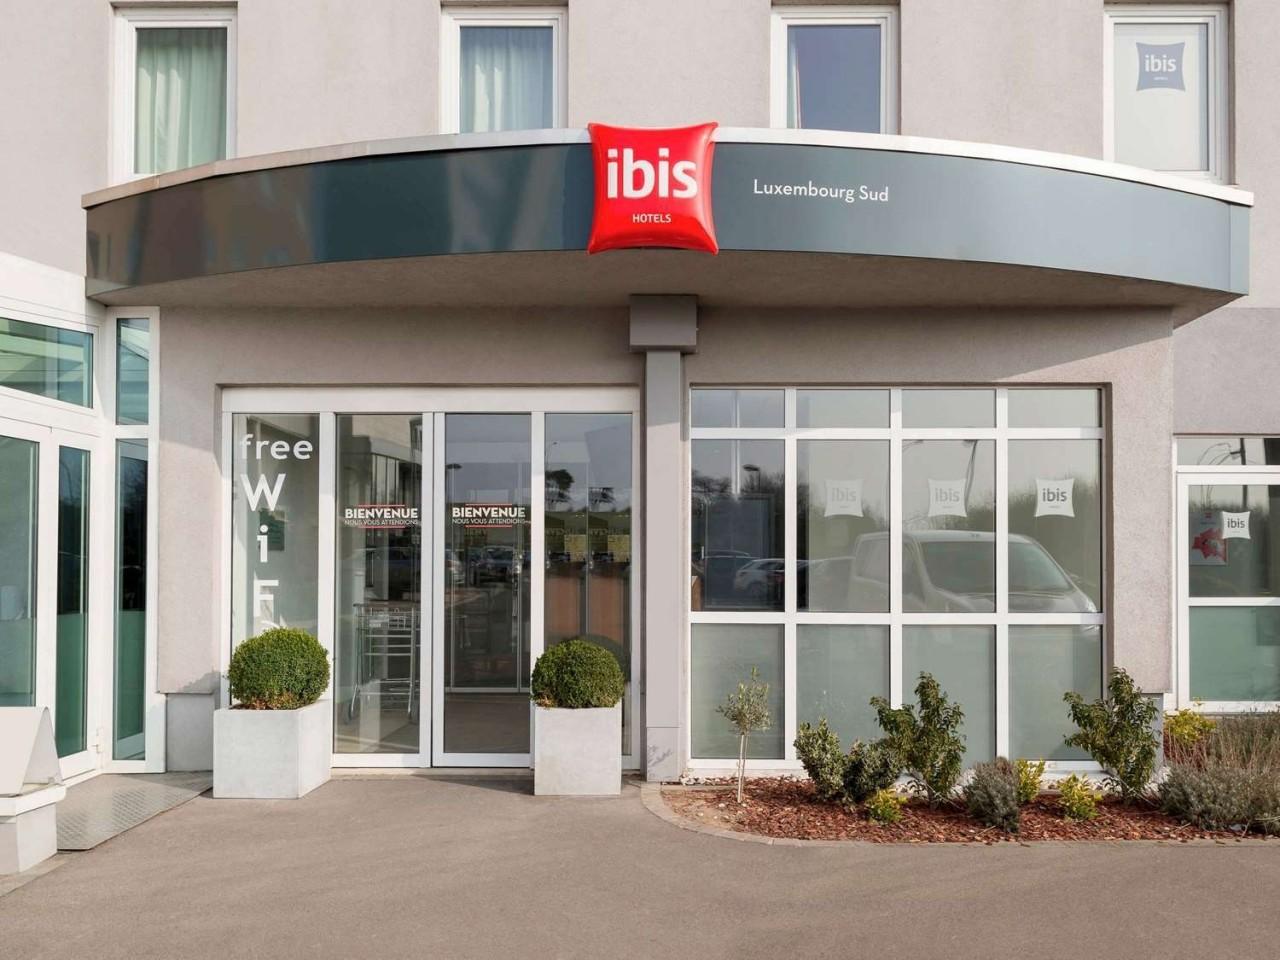 Hotel Blesius Garten Trier Best Of Hotel Ibis Luxembourg Sud 3 Hrs Star Hotel In Bettembourg